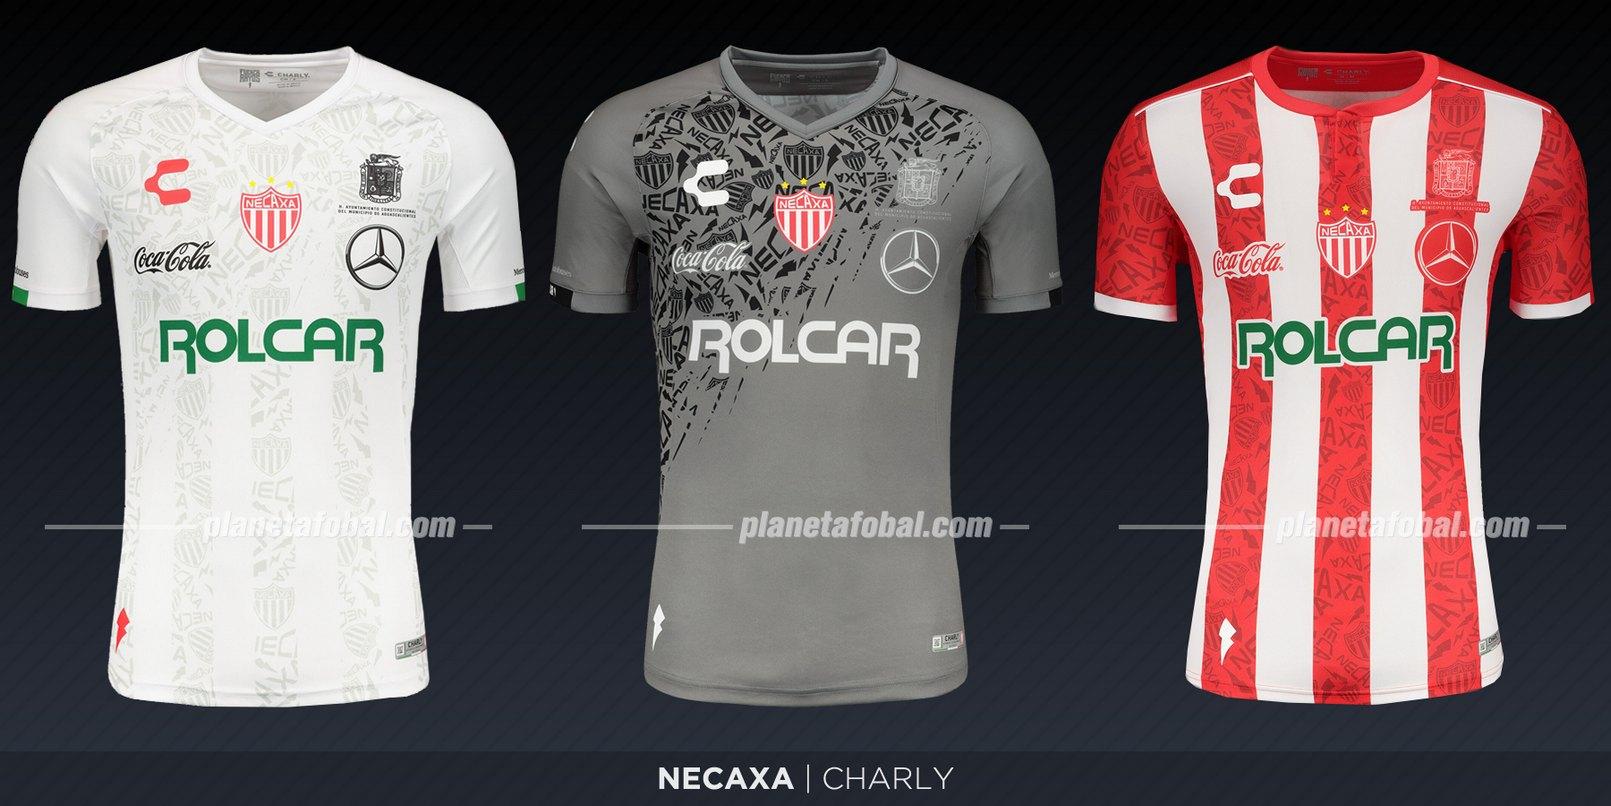 Club Necaxa (Charly) | Camisetas de la Liga MX 2019-2020